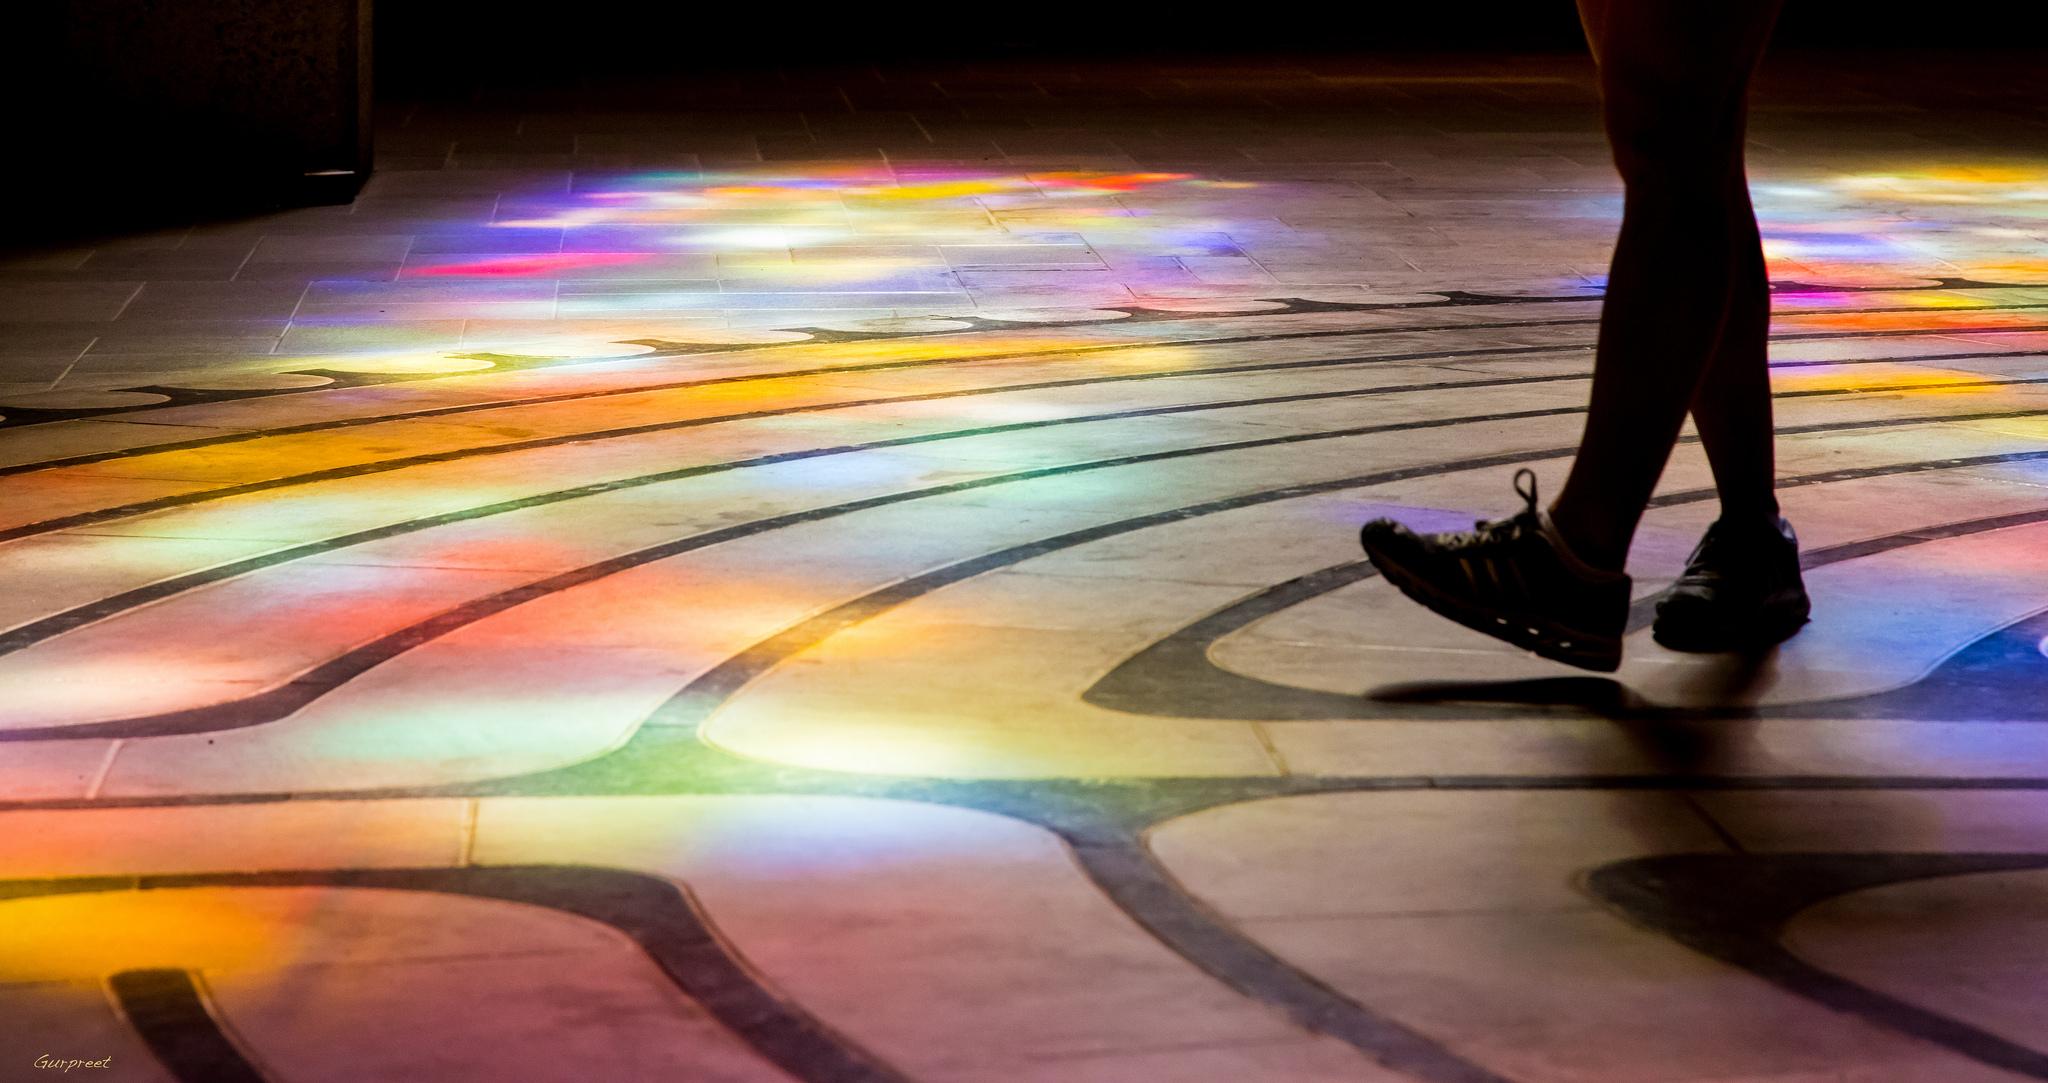 Indoor labyrinth © GPS/Flickr